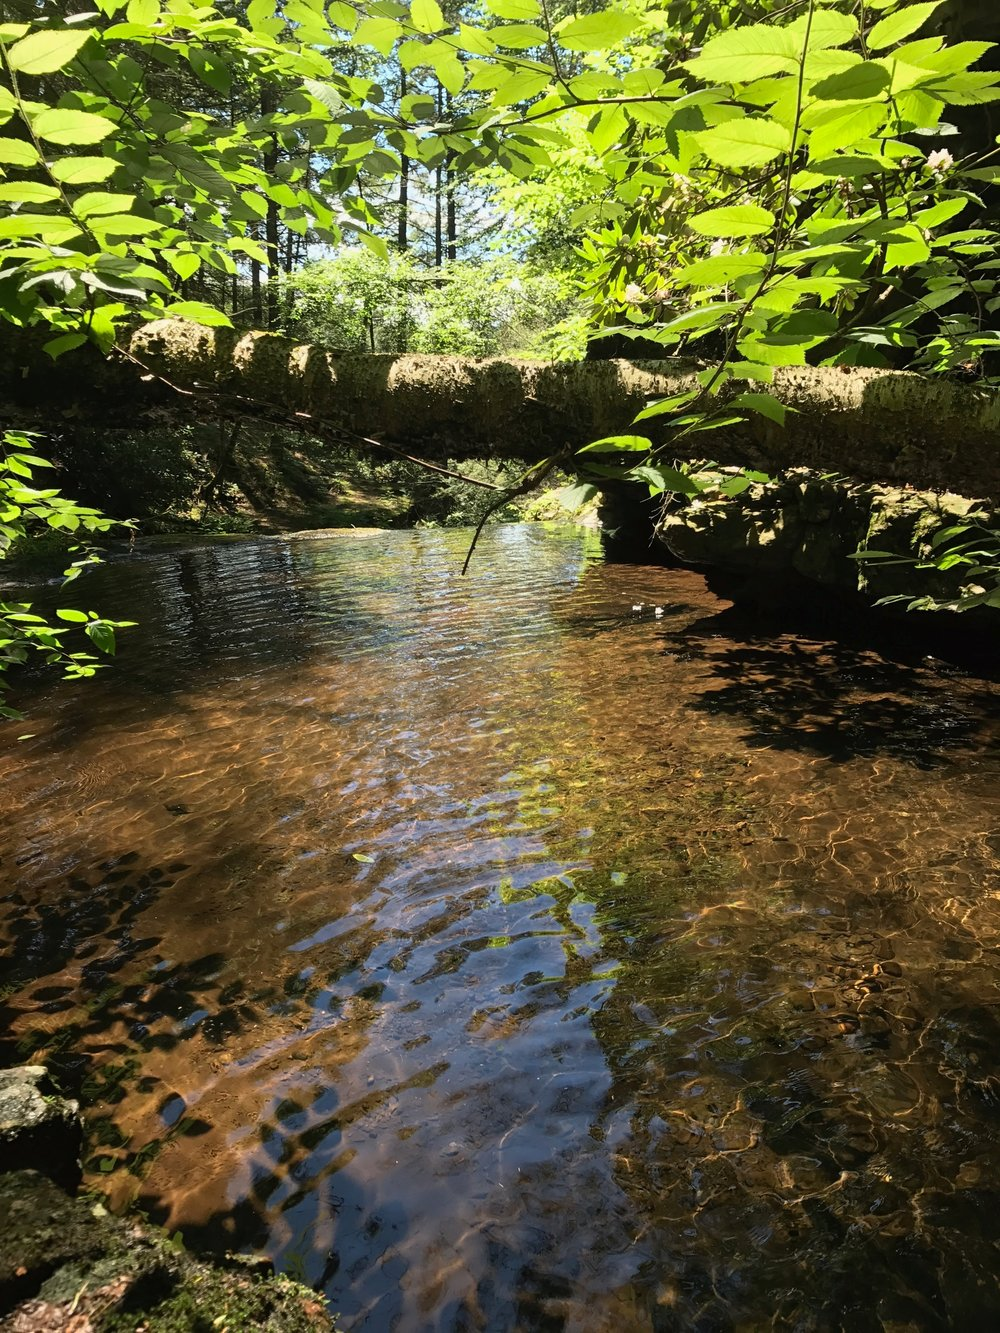 Giggles Falls; Sarah Acker-Krzywicki, Milton Academy